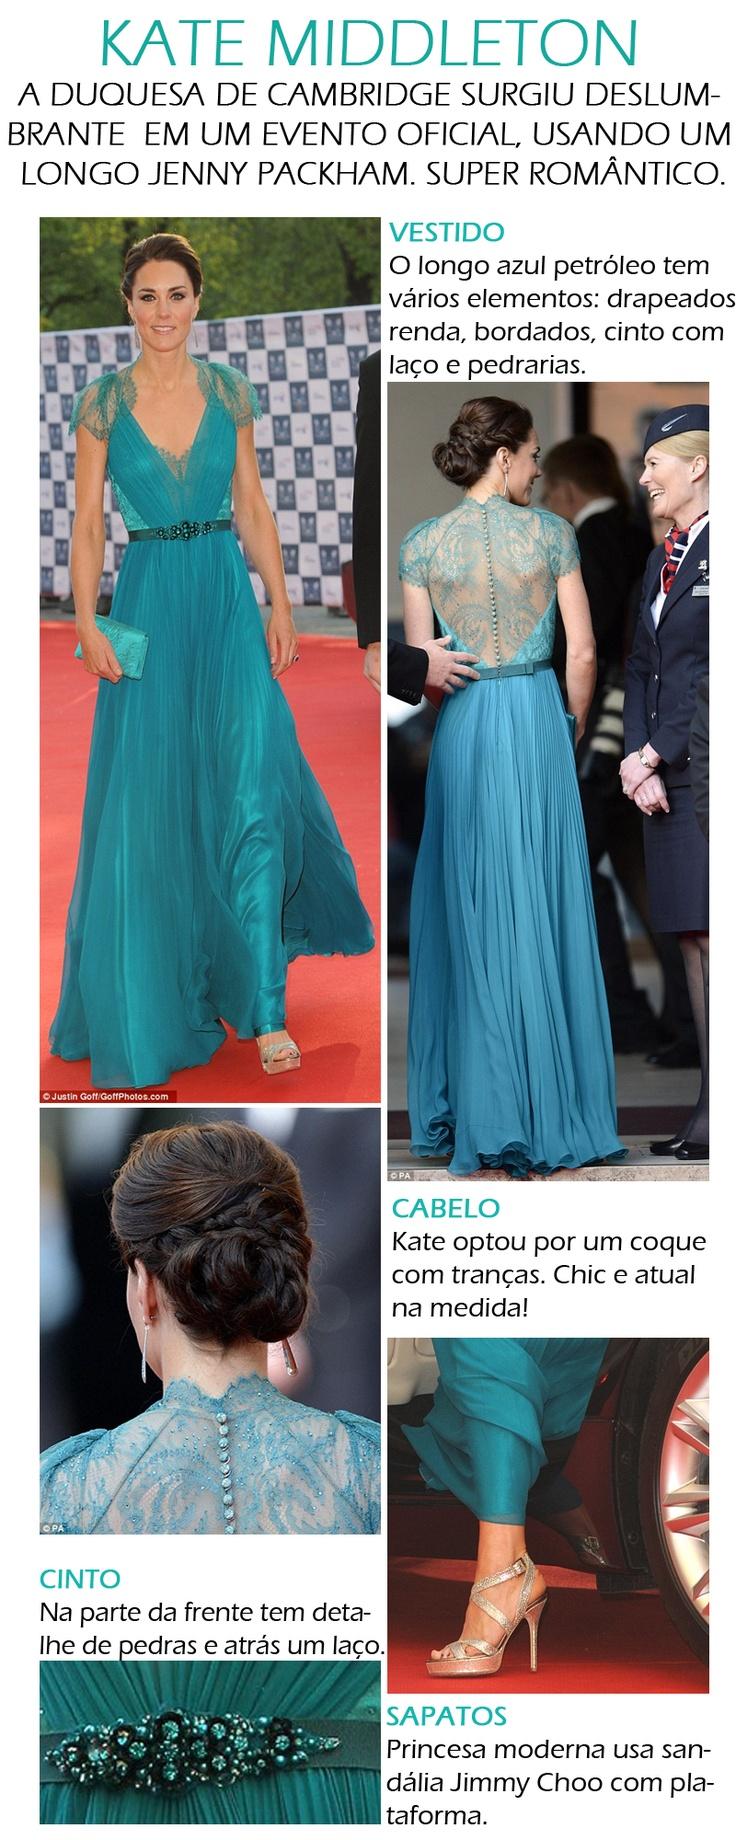 Kate Middleton in Jenny Packham dress: Concerts, Fashion, Style, Dresses Me Up, Royals Albert Hall, Royal Albert Hall, Copy Kate, Packham Dresses, The Royals